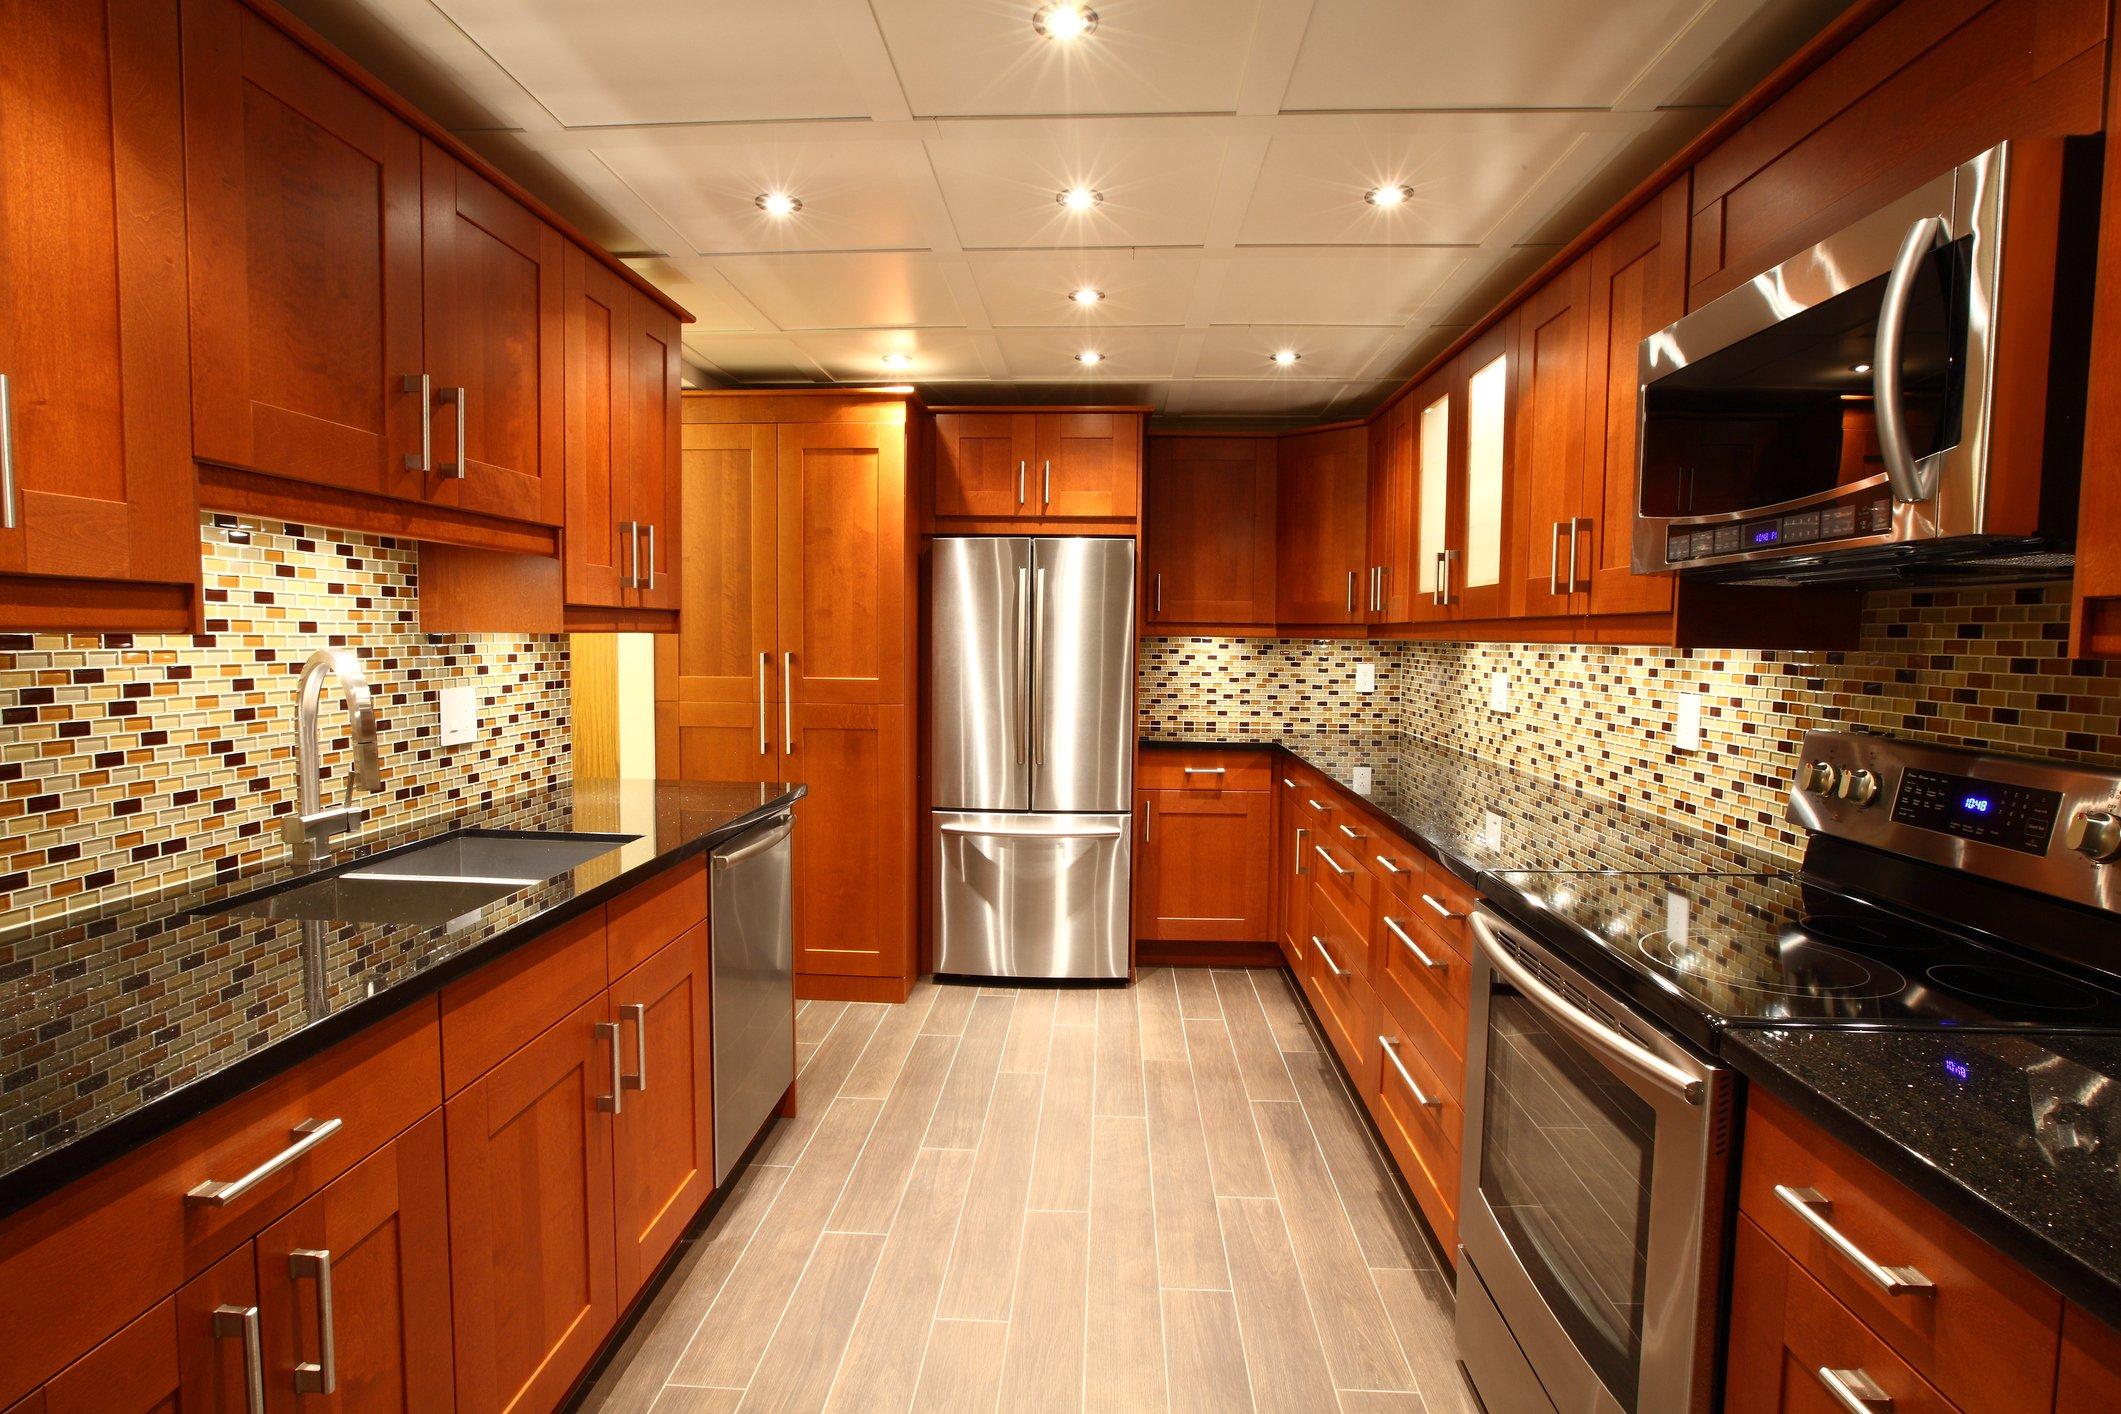 Kitchen Cabinets Greenwich, CT